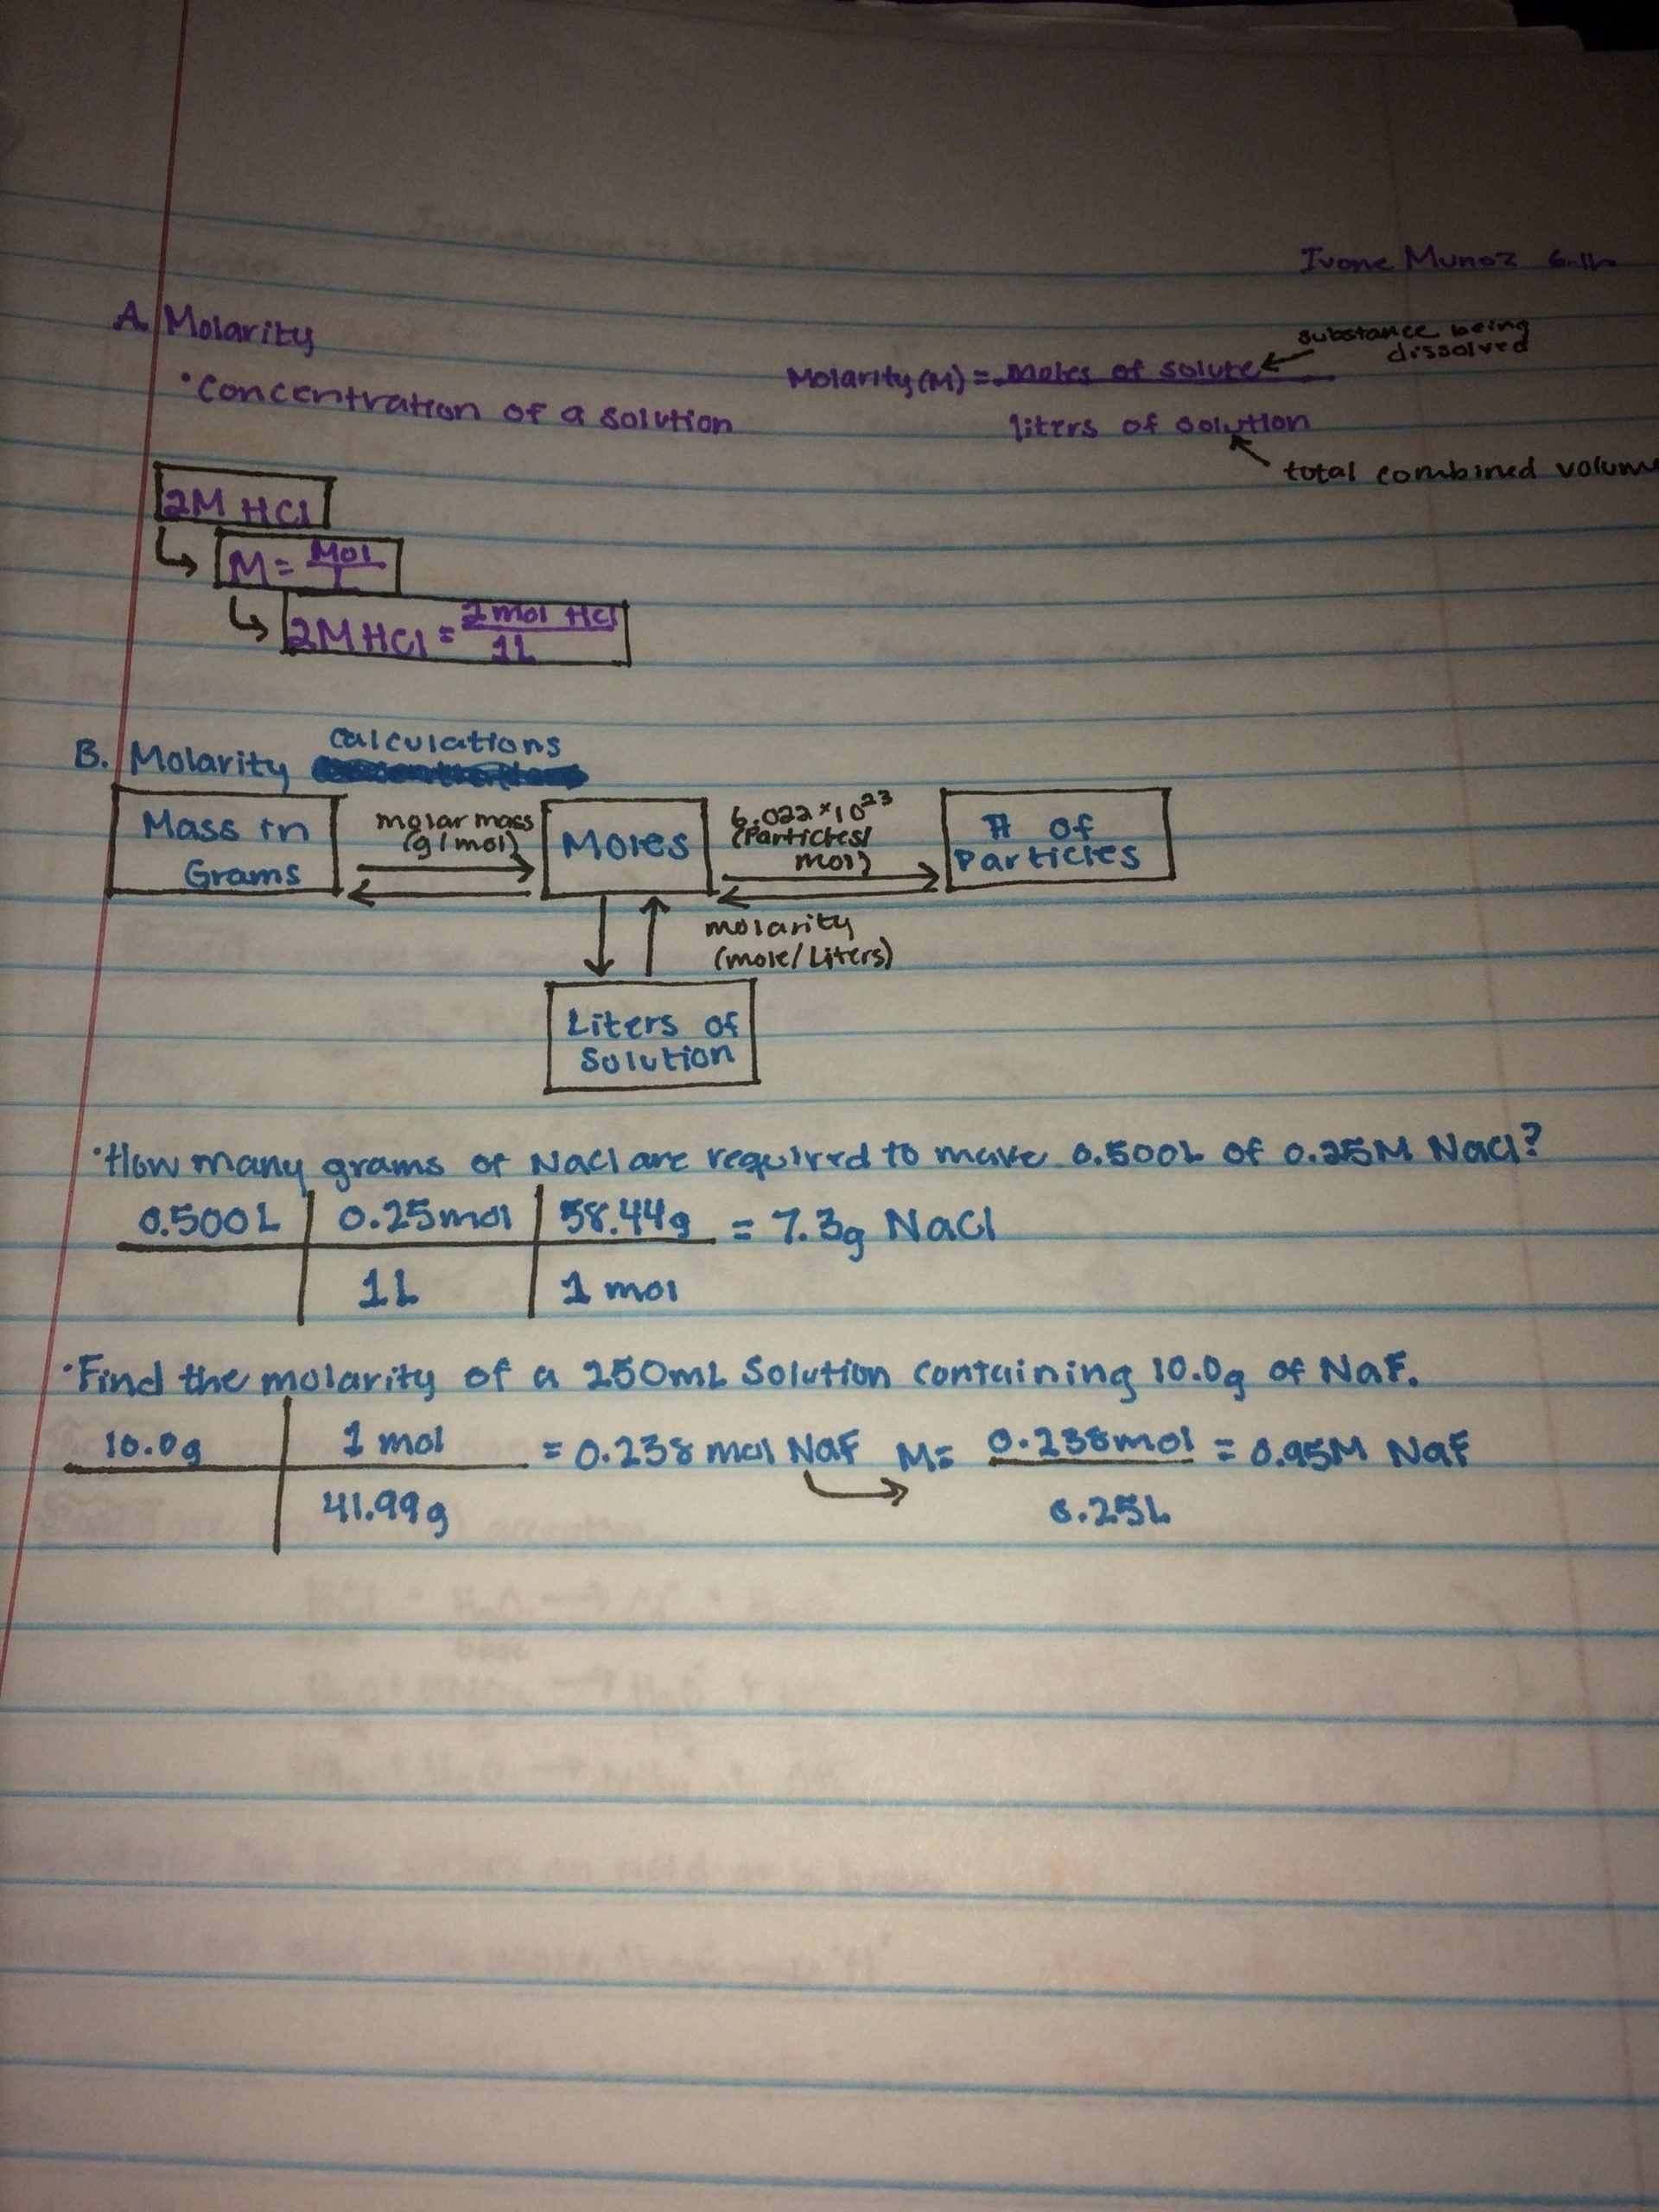 Photoelectron Spectroscopy Worksheet Answers Chemistry Image By Ivone Munoz In 2020 Worksheet Template Worksheets Printable Worksheets